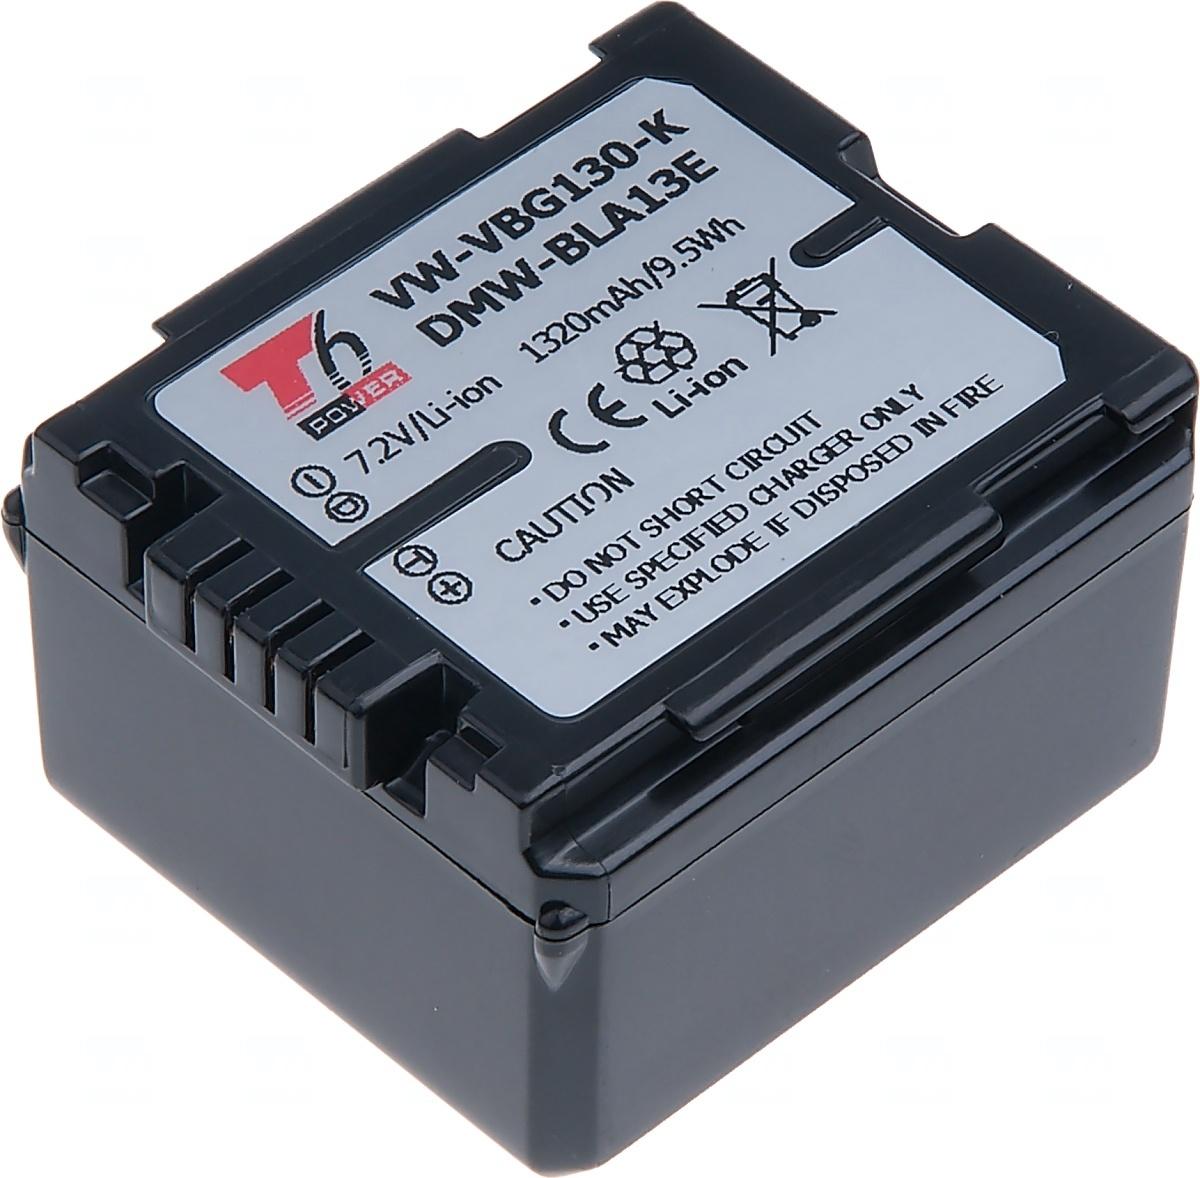 Baterie T6 power Panasonic VW-VBG130, 1320mAh, černá (Baterie a gripy)